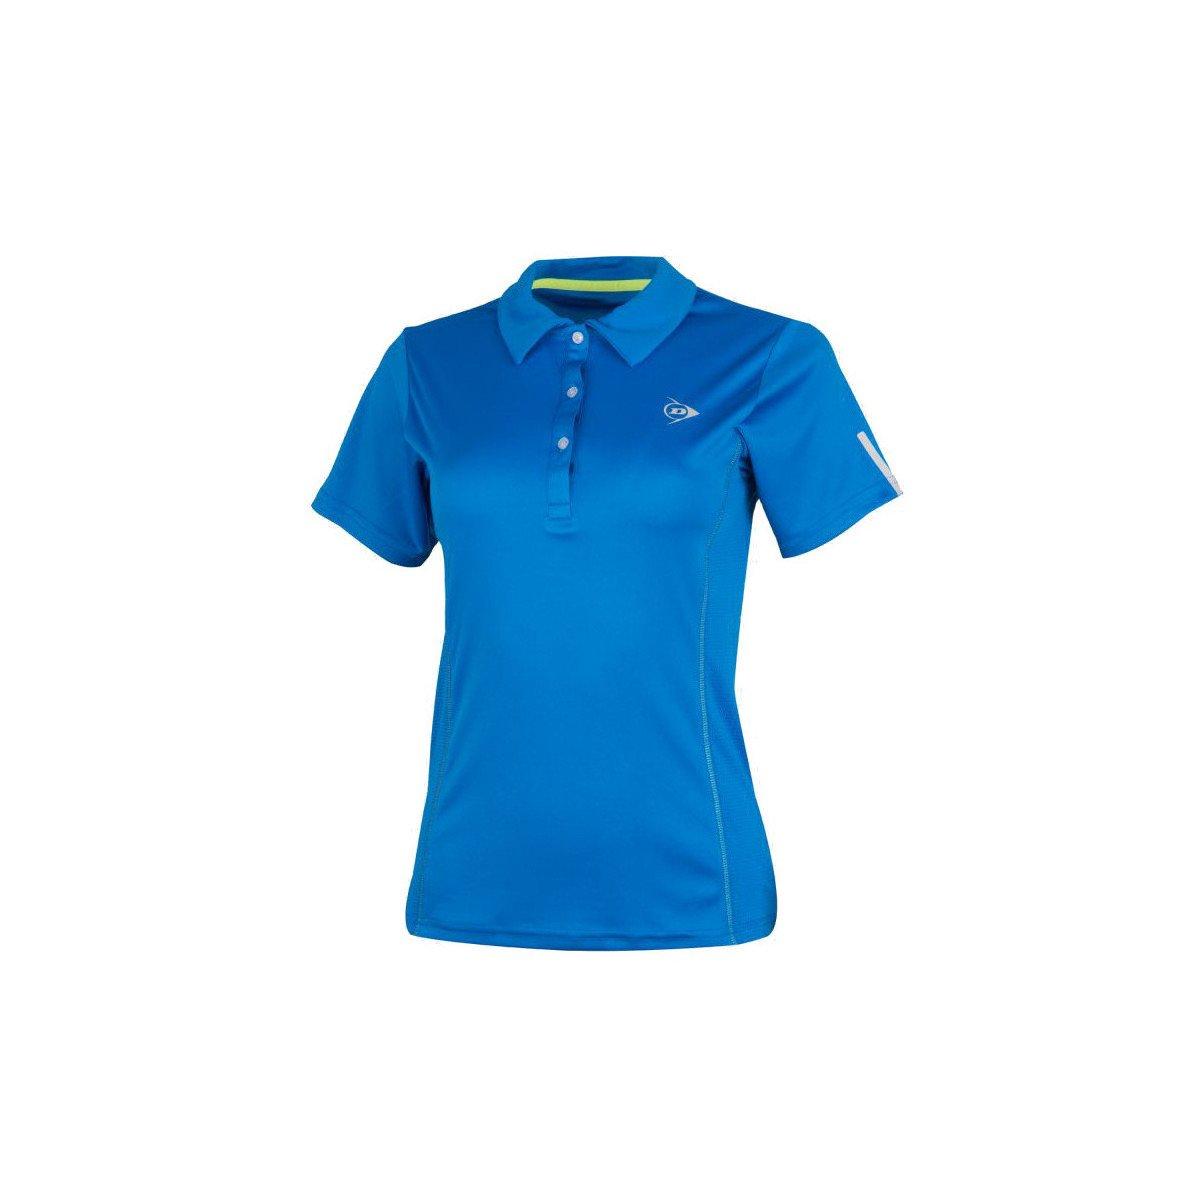 Dunlop Women's Club Collection Polo Tennis Shirt (Blue)